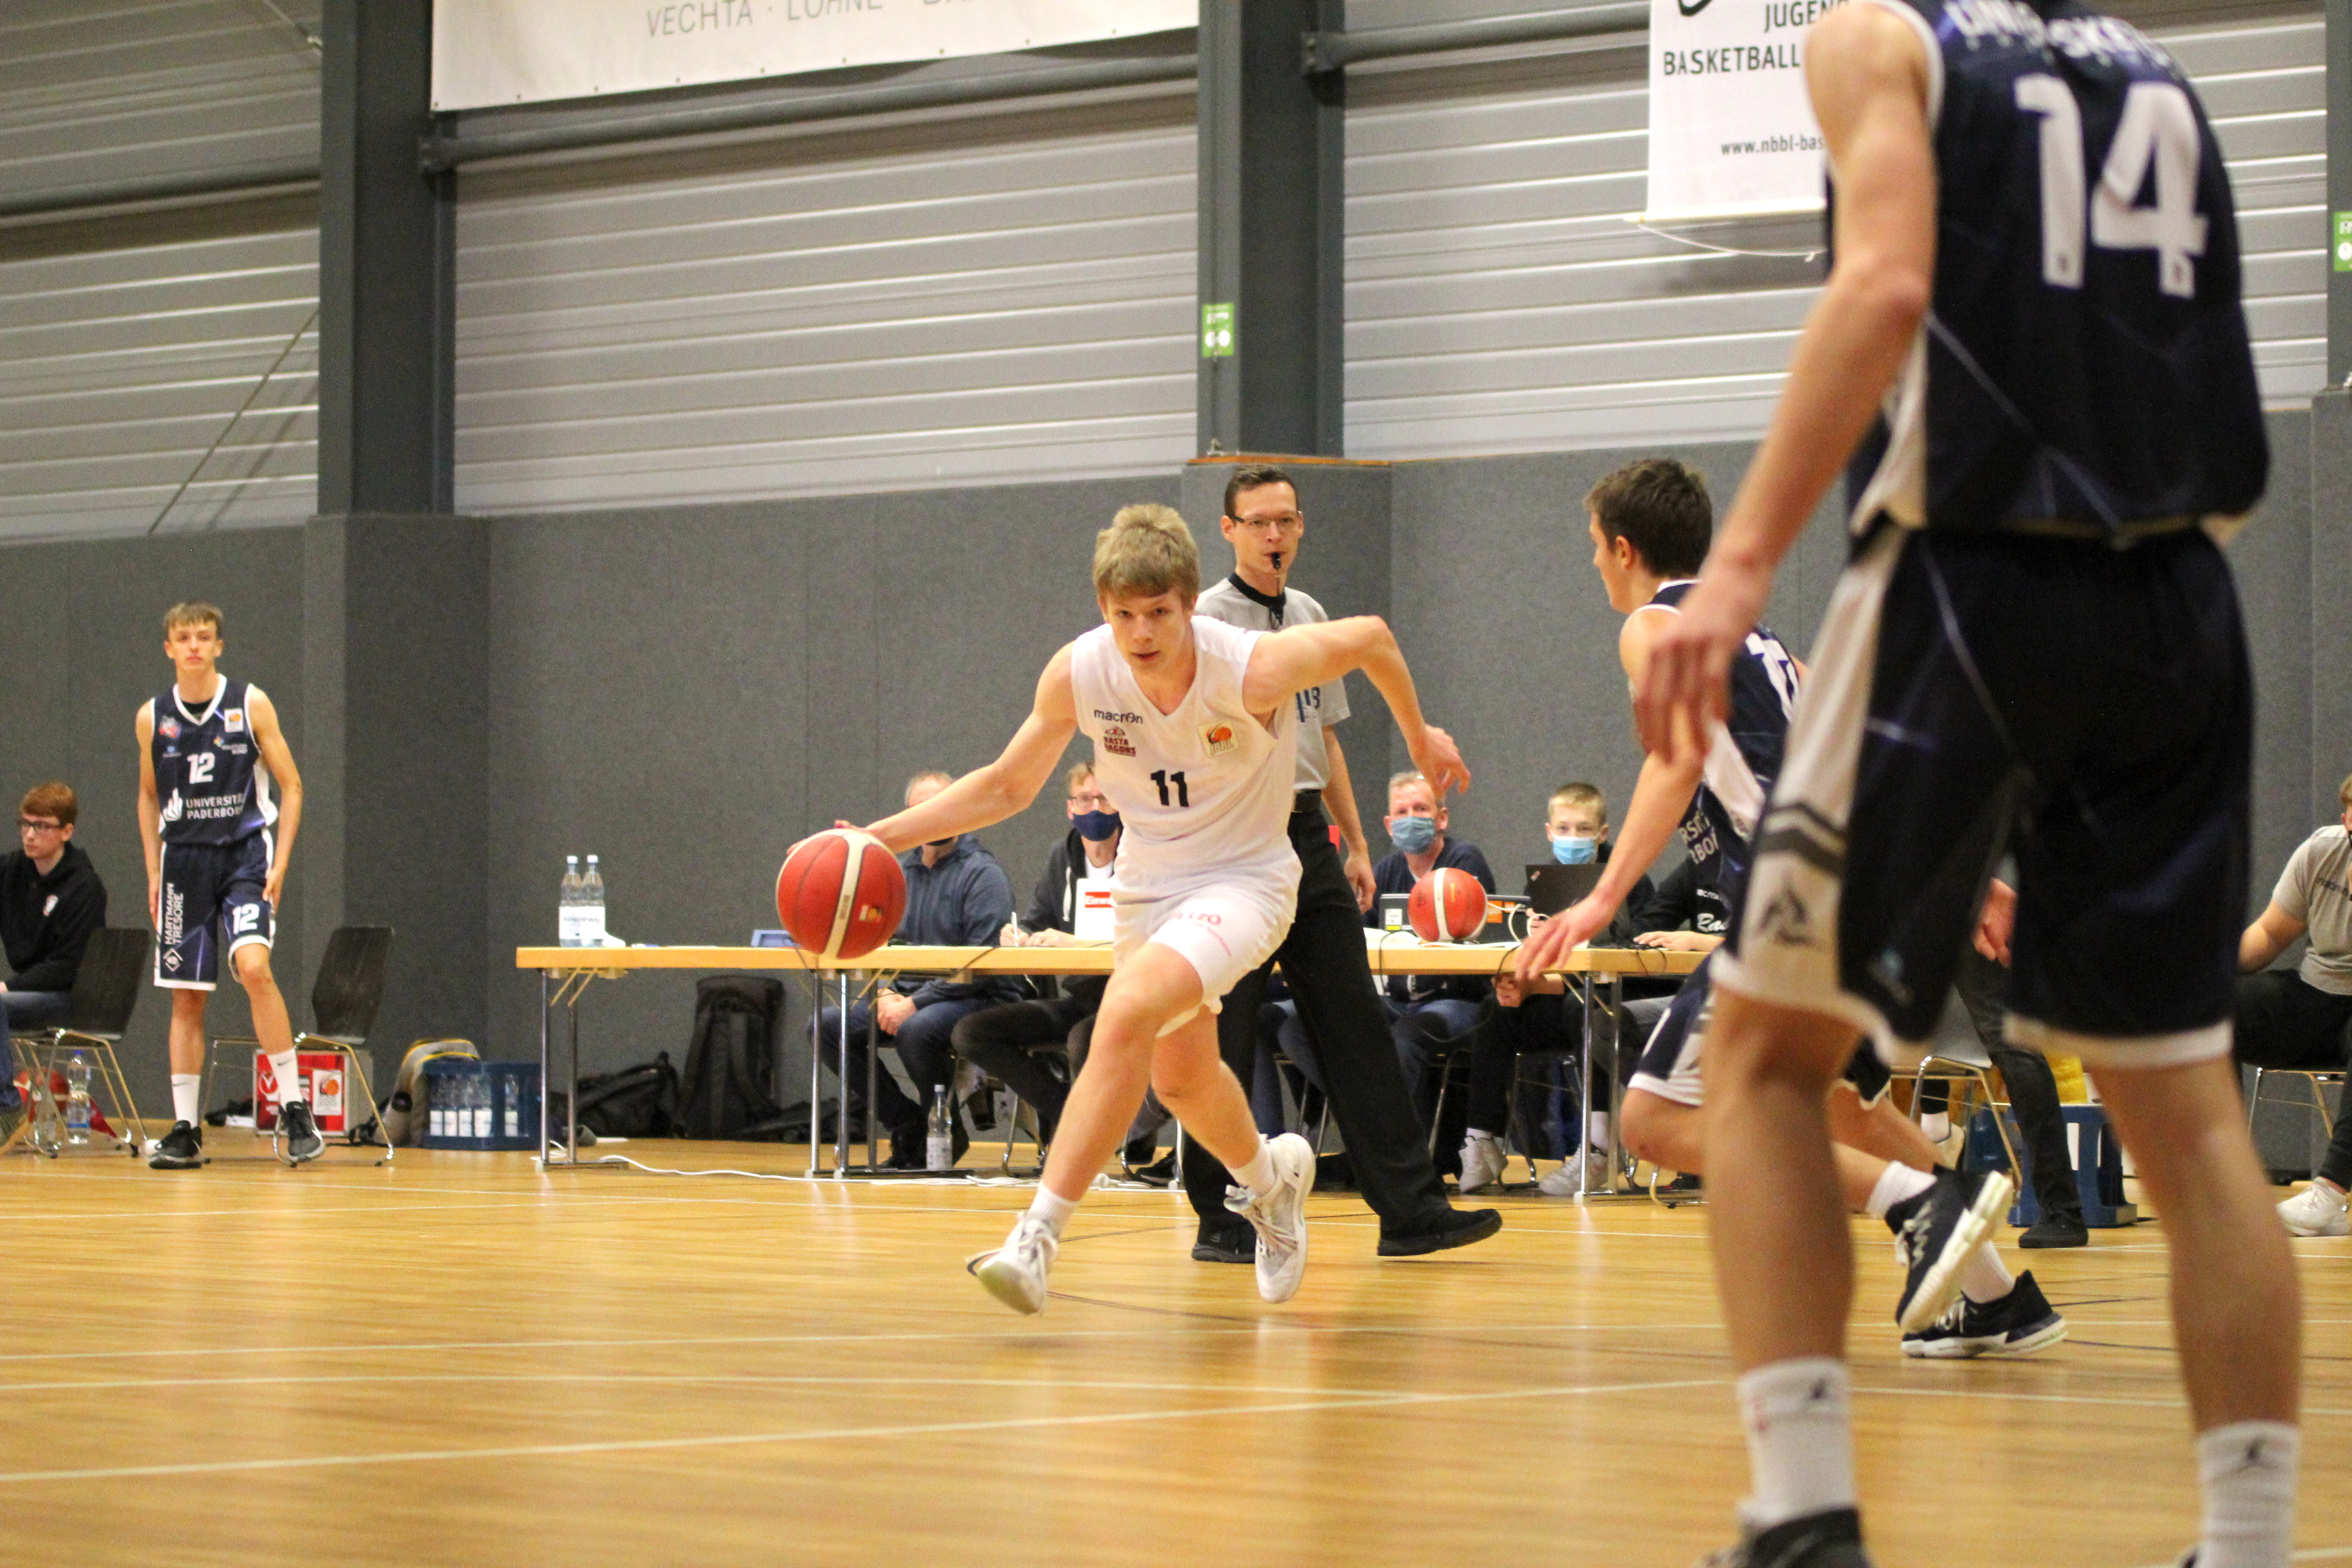 JBBL_20-21_YOUNG-RASTA-DRAGONS_Paderborn_Spieltag2_Karl-Buehner4